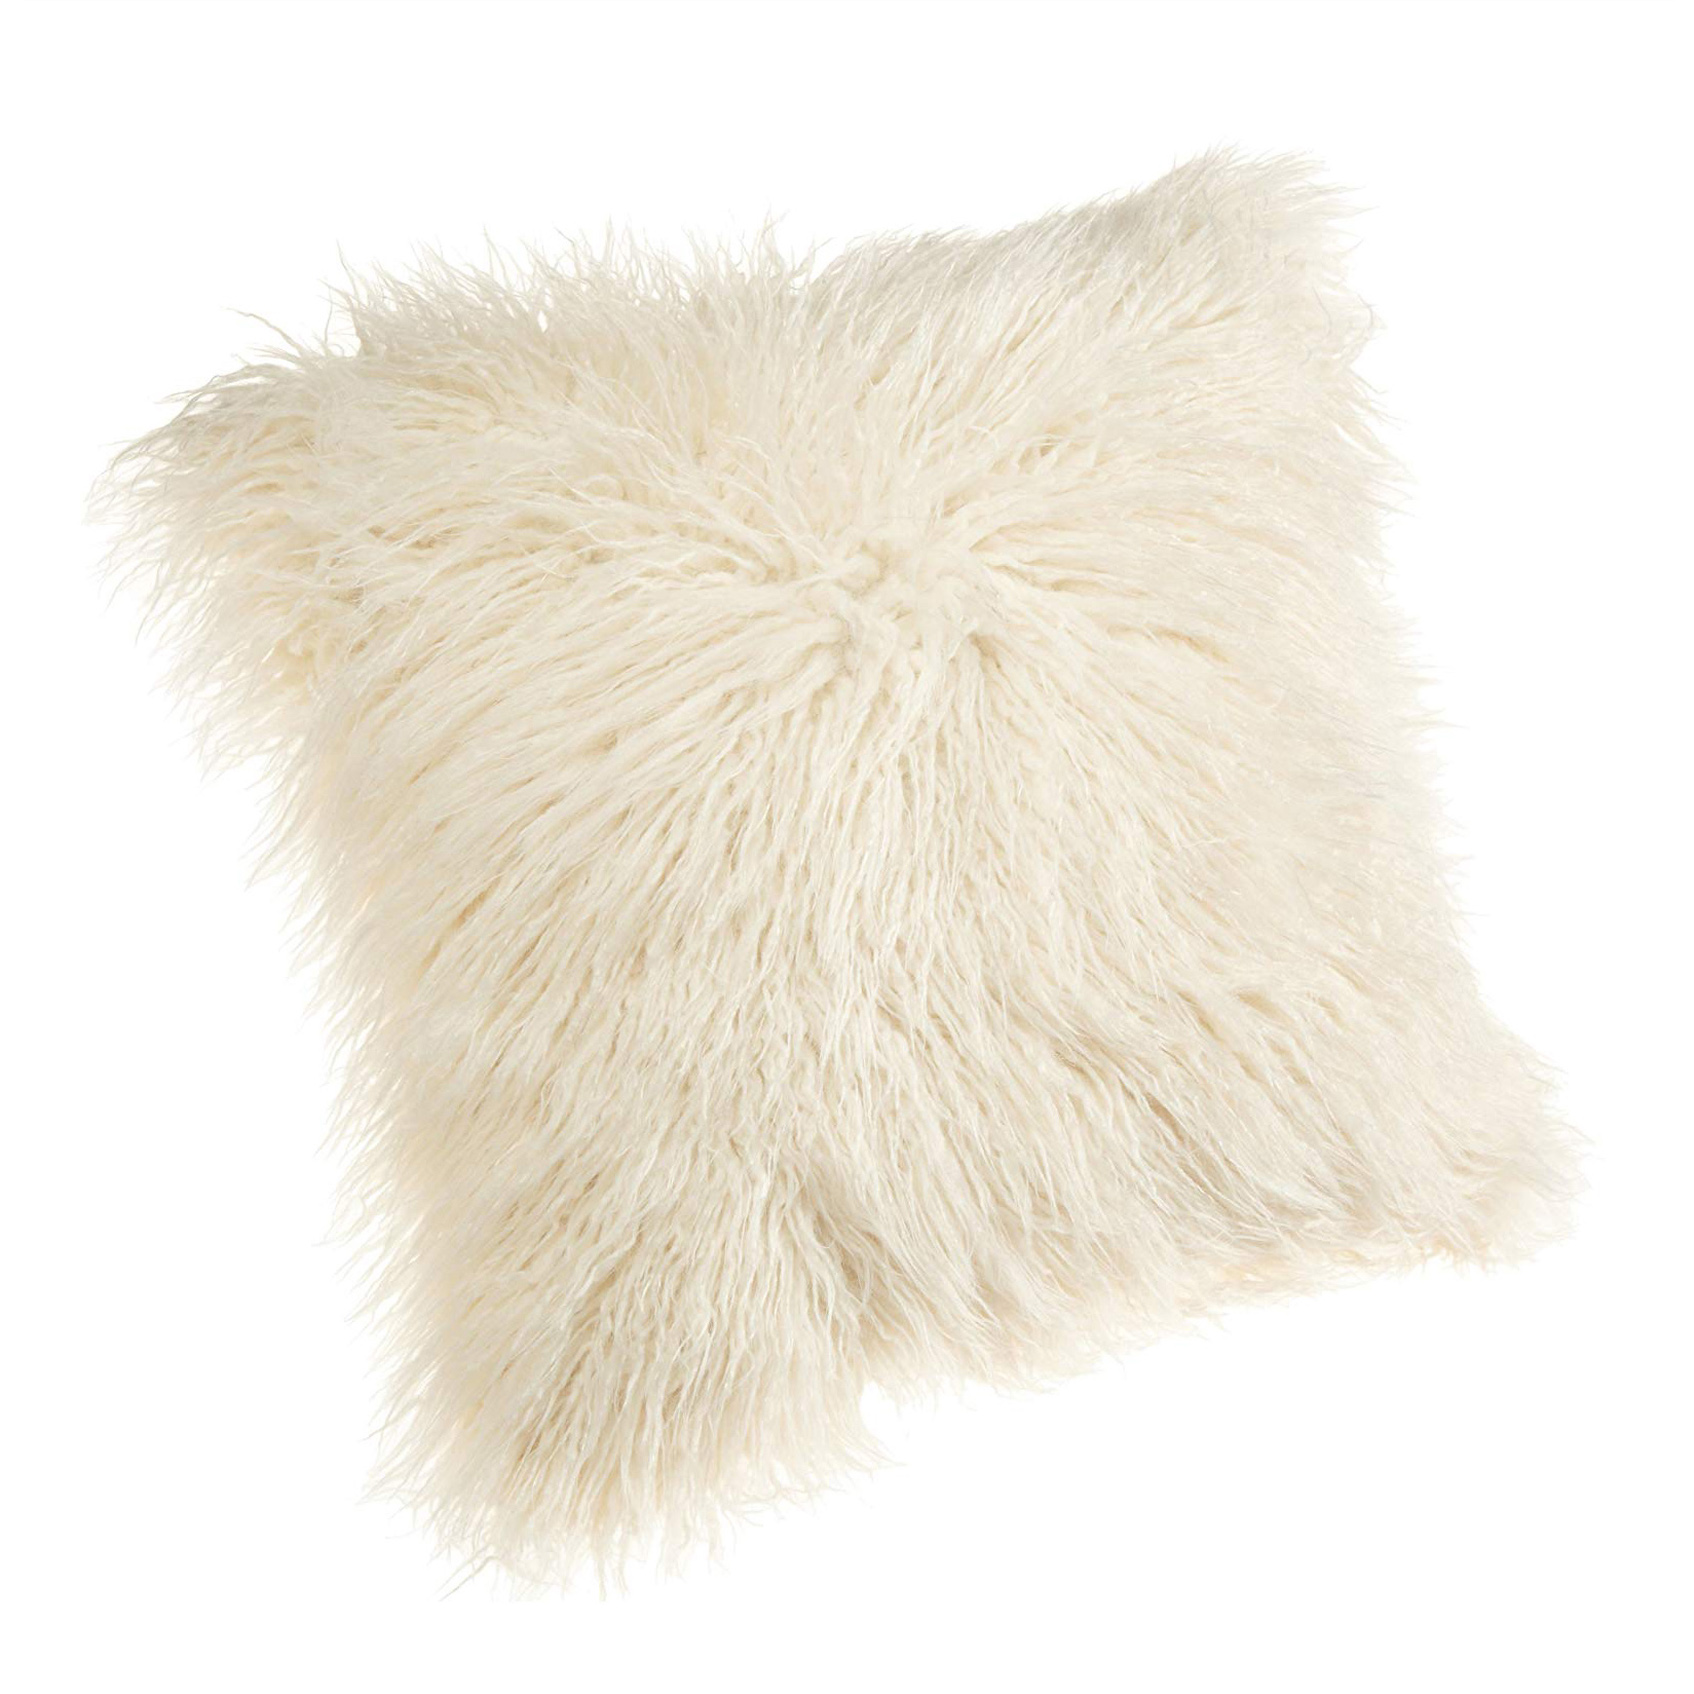 faux fur pillow, boho-chic home decor